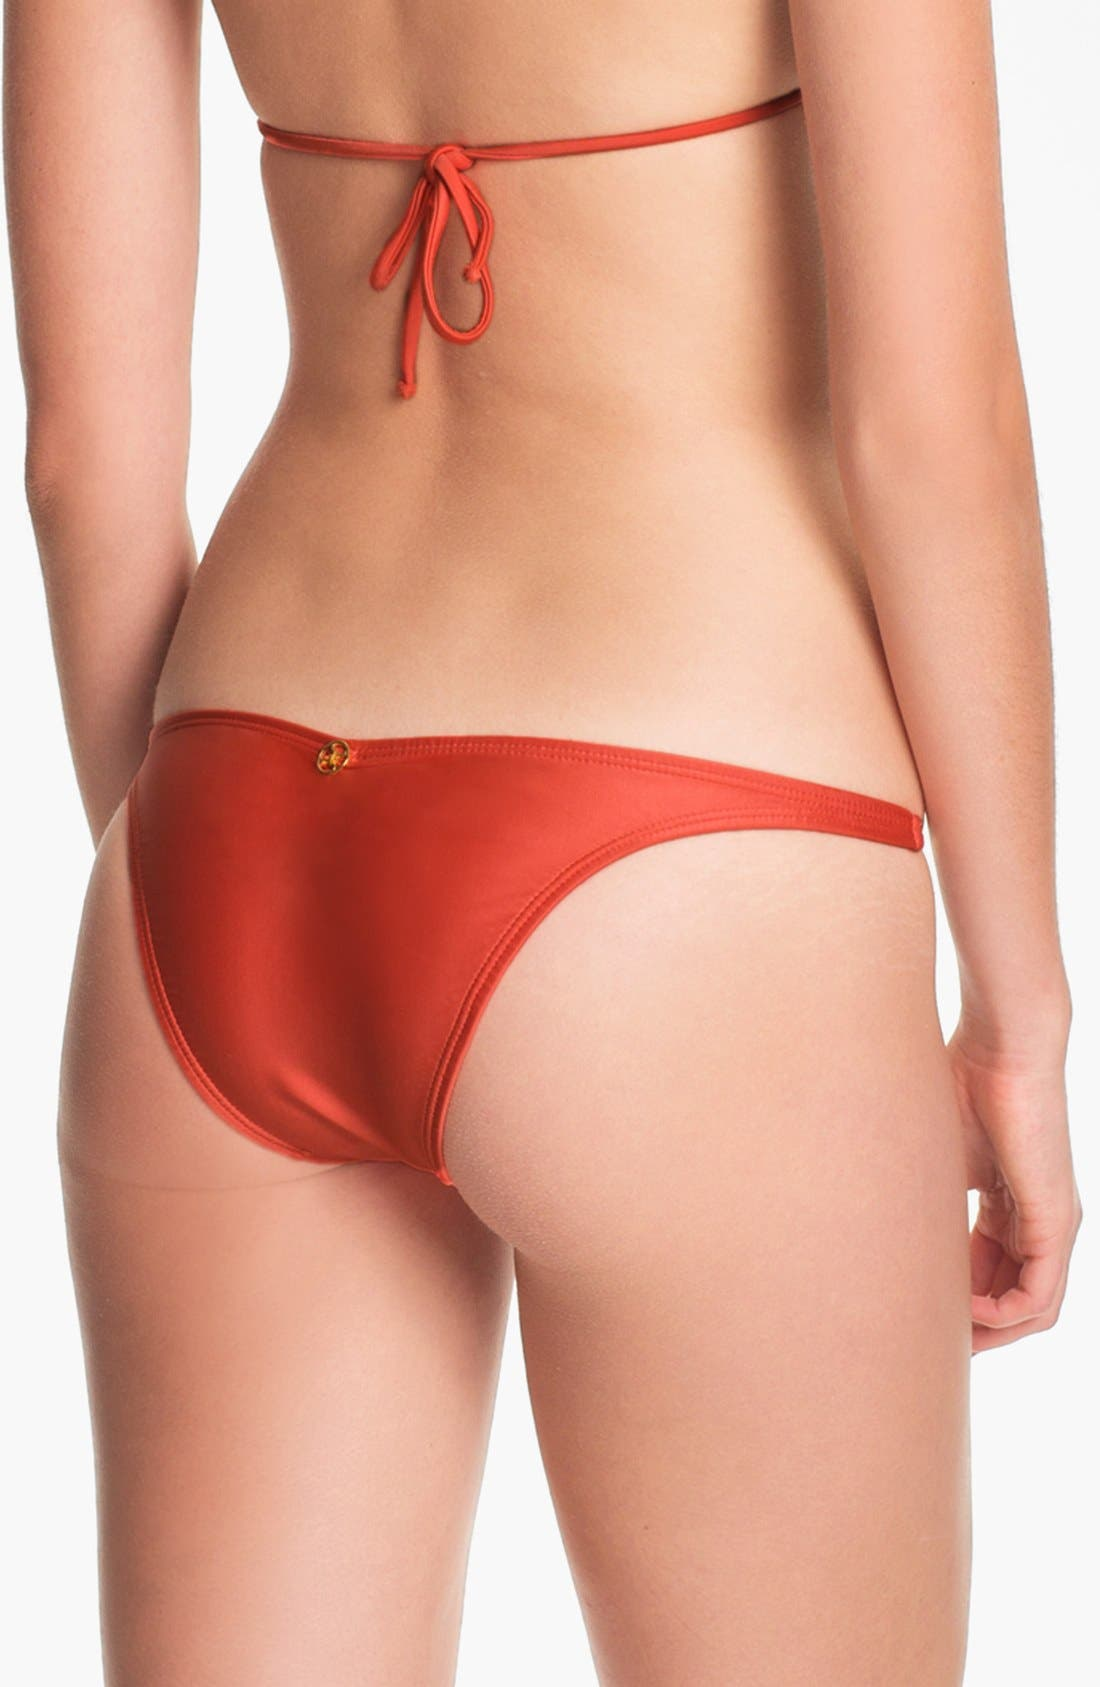 Main Image - ViX Swimwear Hardware Detail Bikini Top & Bottoms